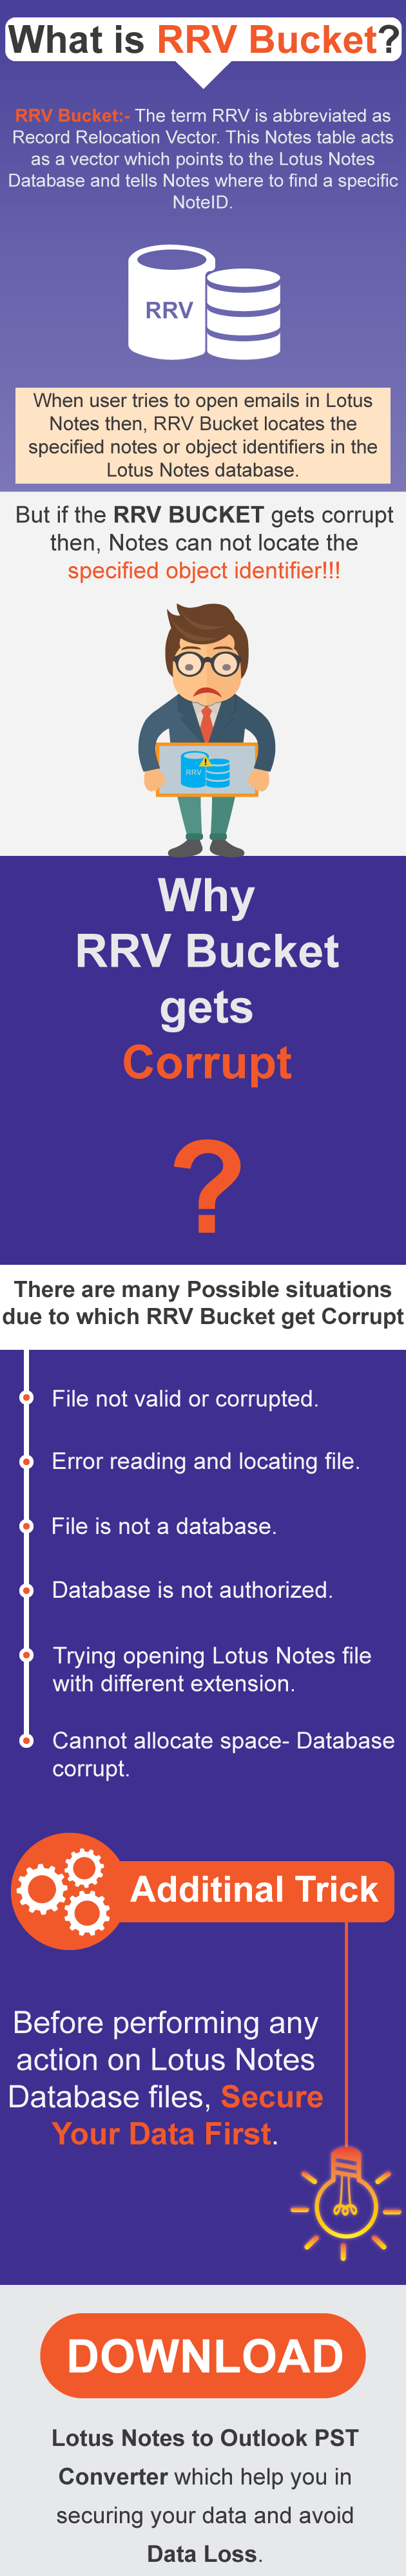 rrv bucket corrupt